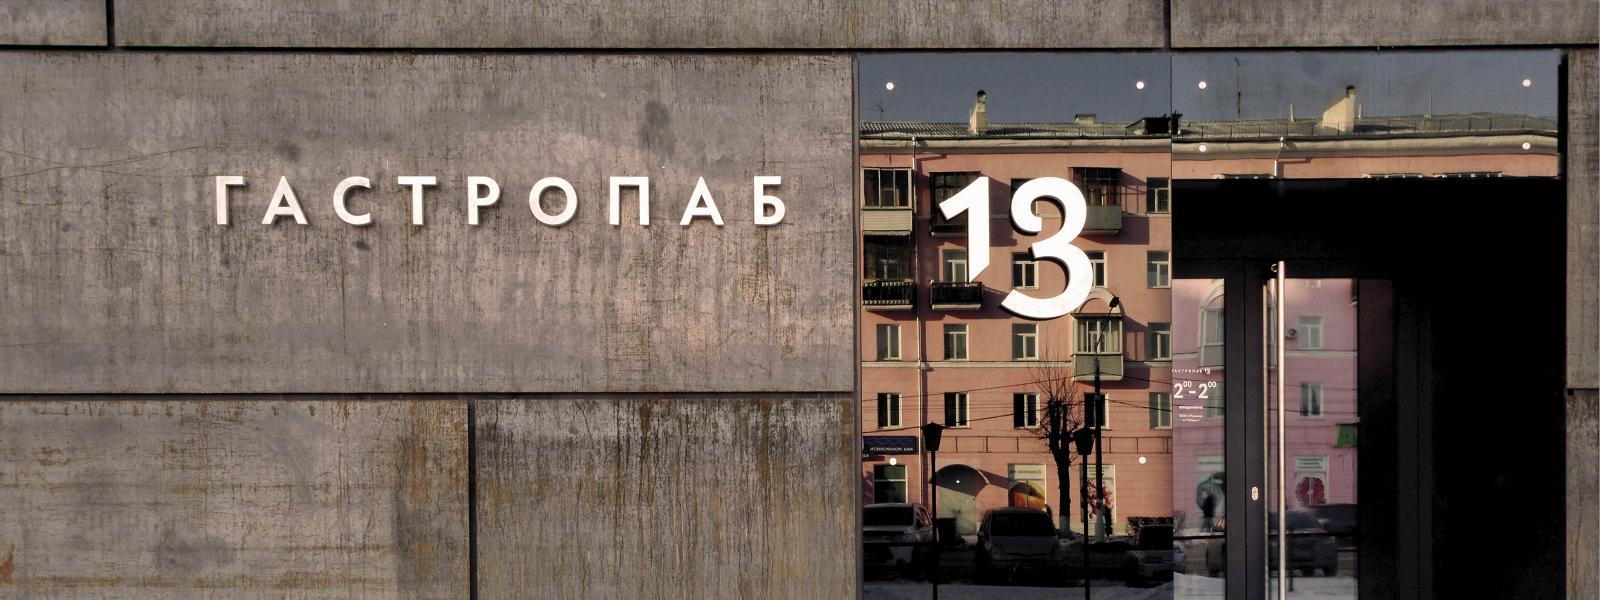 "work-Реконструкция фасадов ""Гастропаб 13"" в Барнауле"